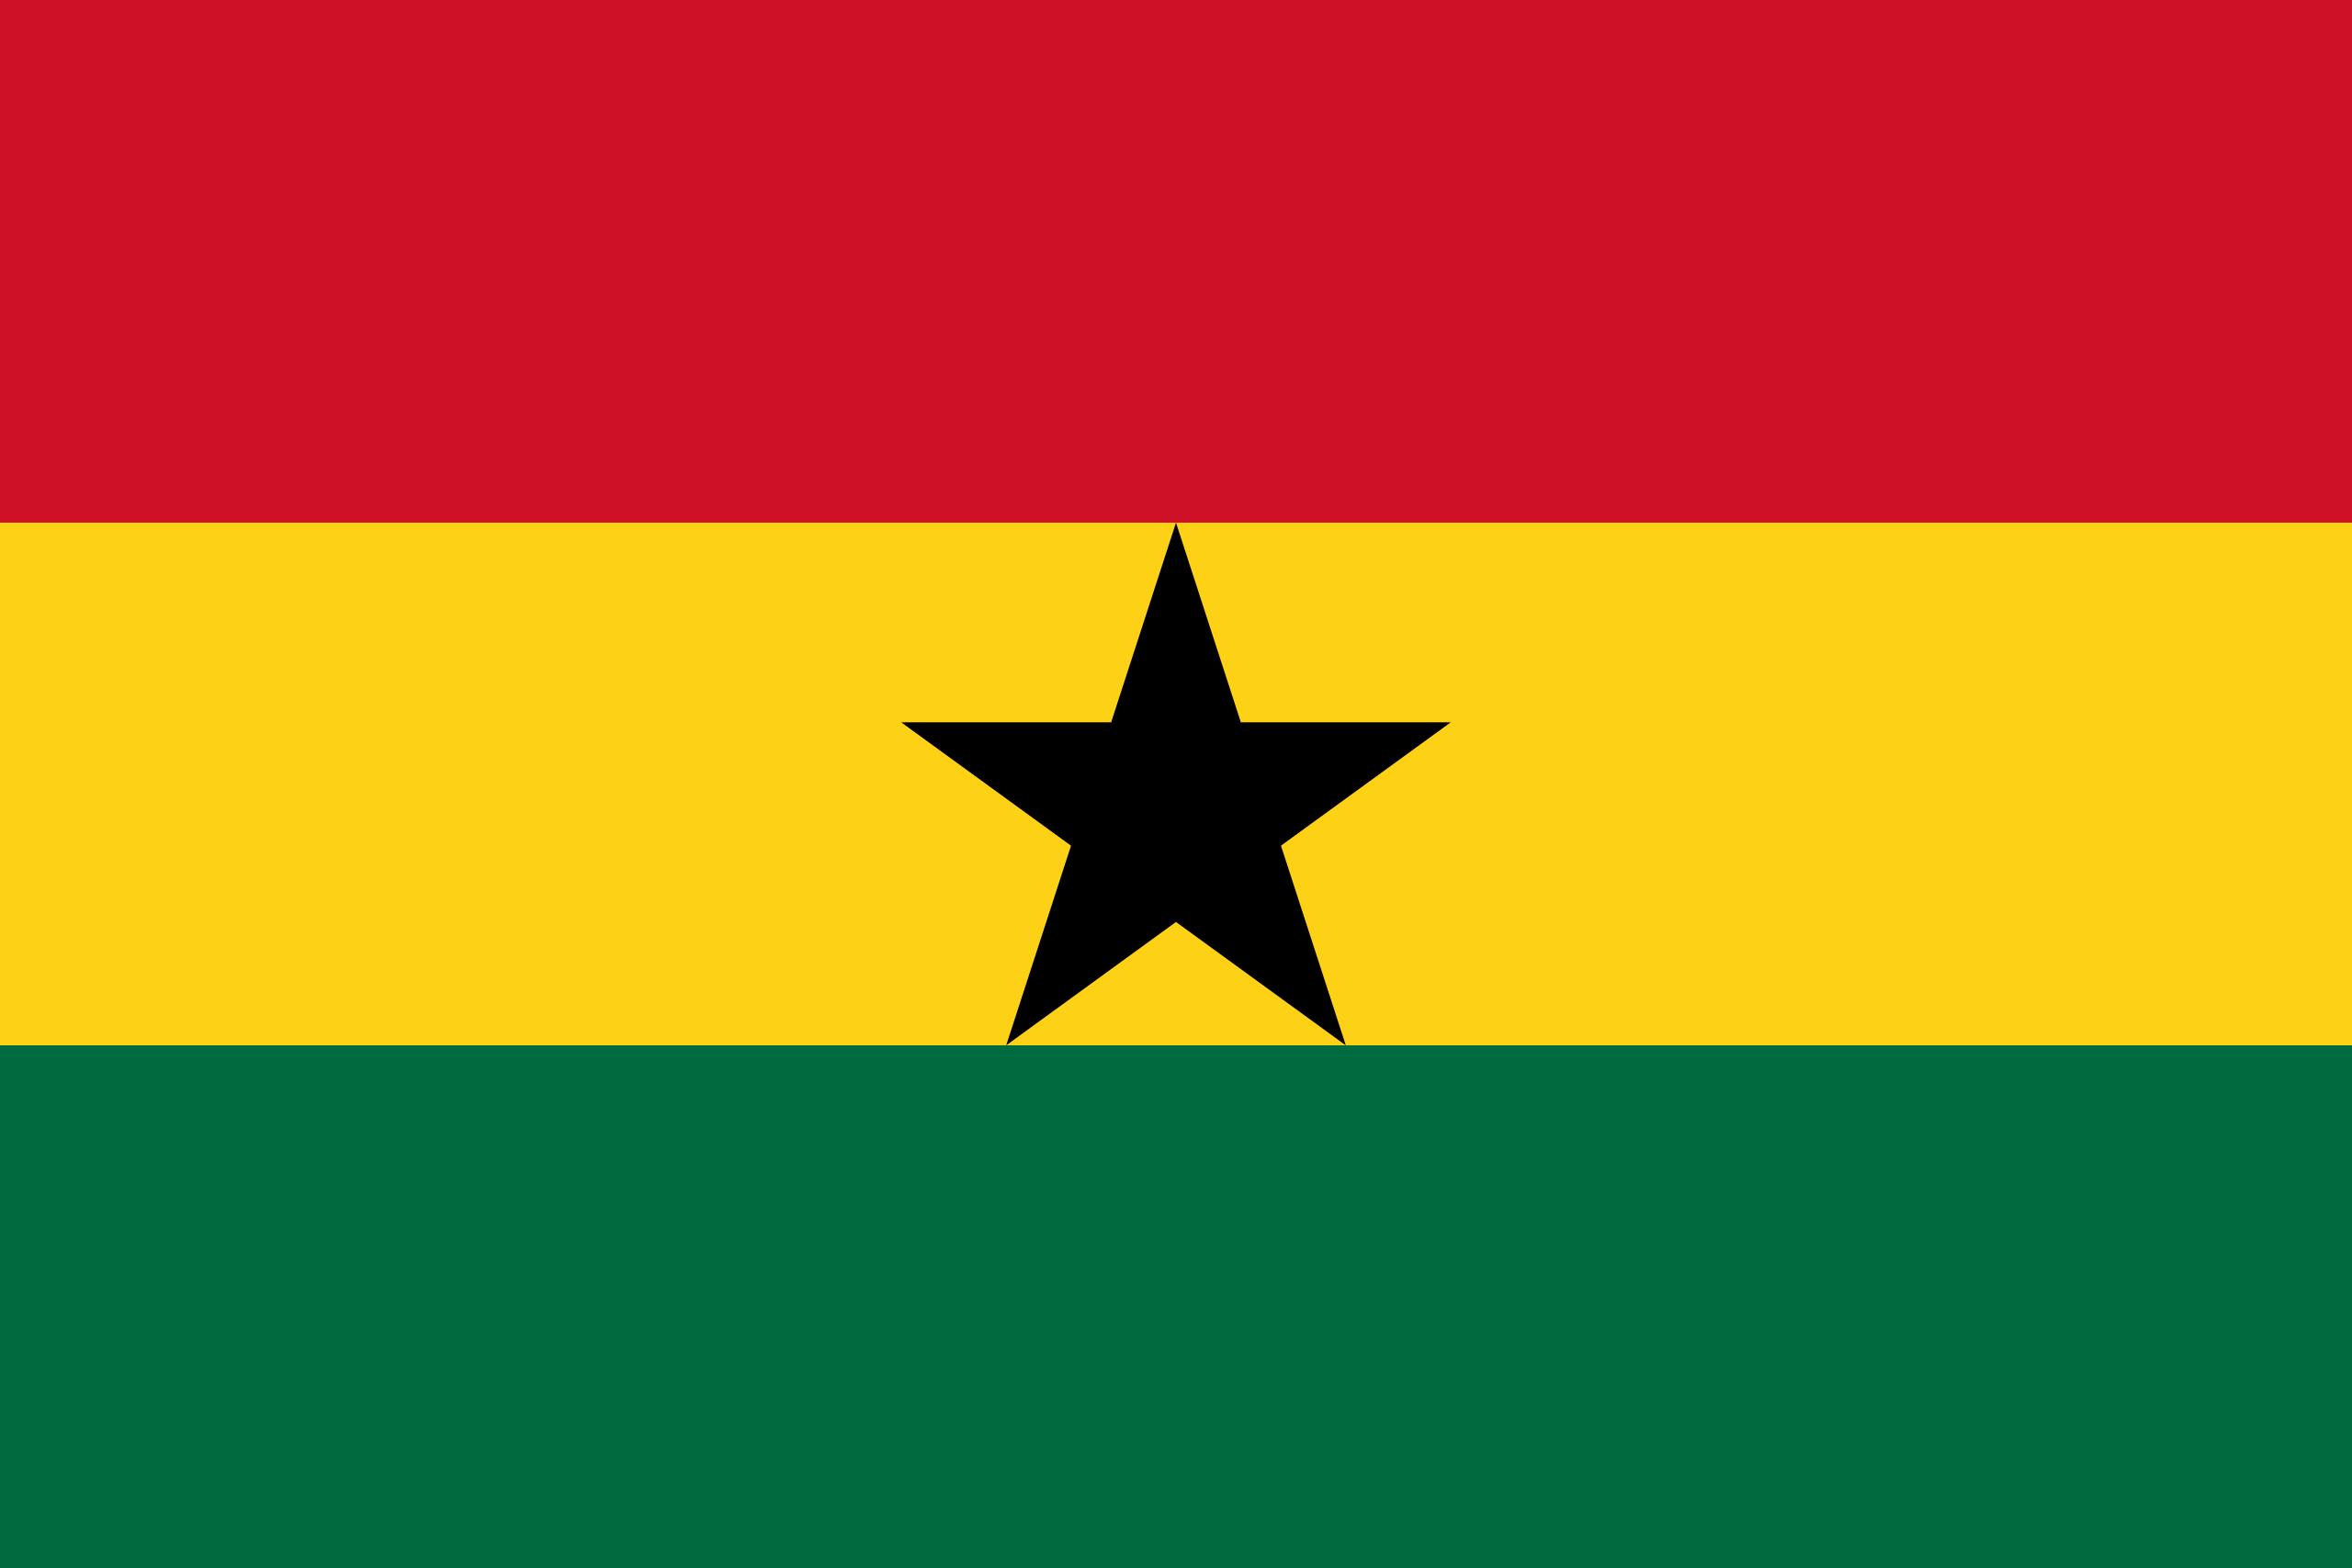 ghana, страна, Эмблема, логотип, символ - Обои HD - Профессор falken.com